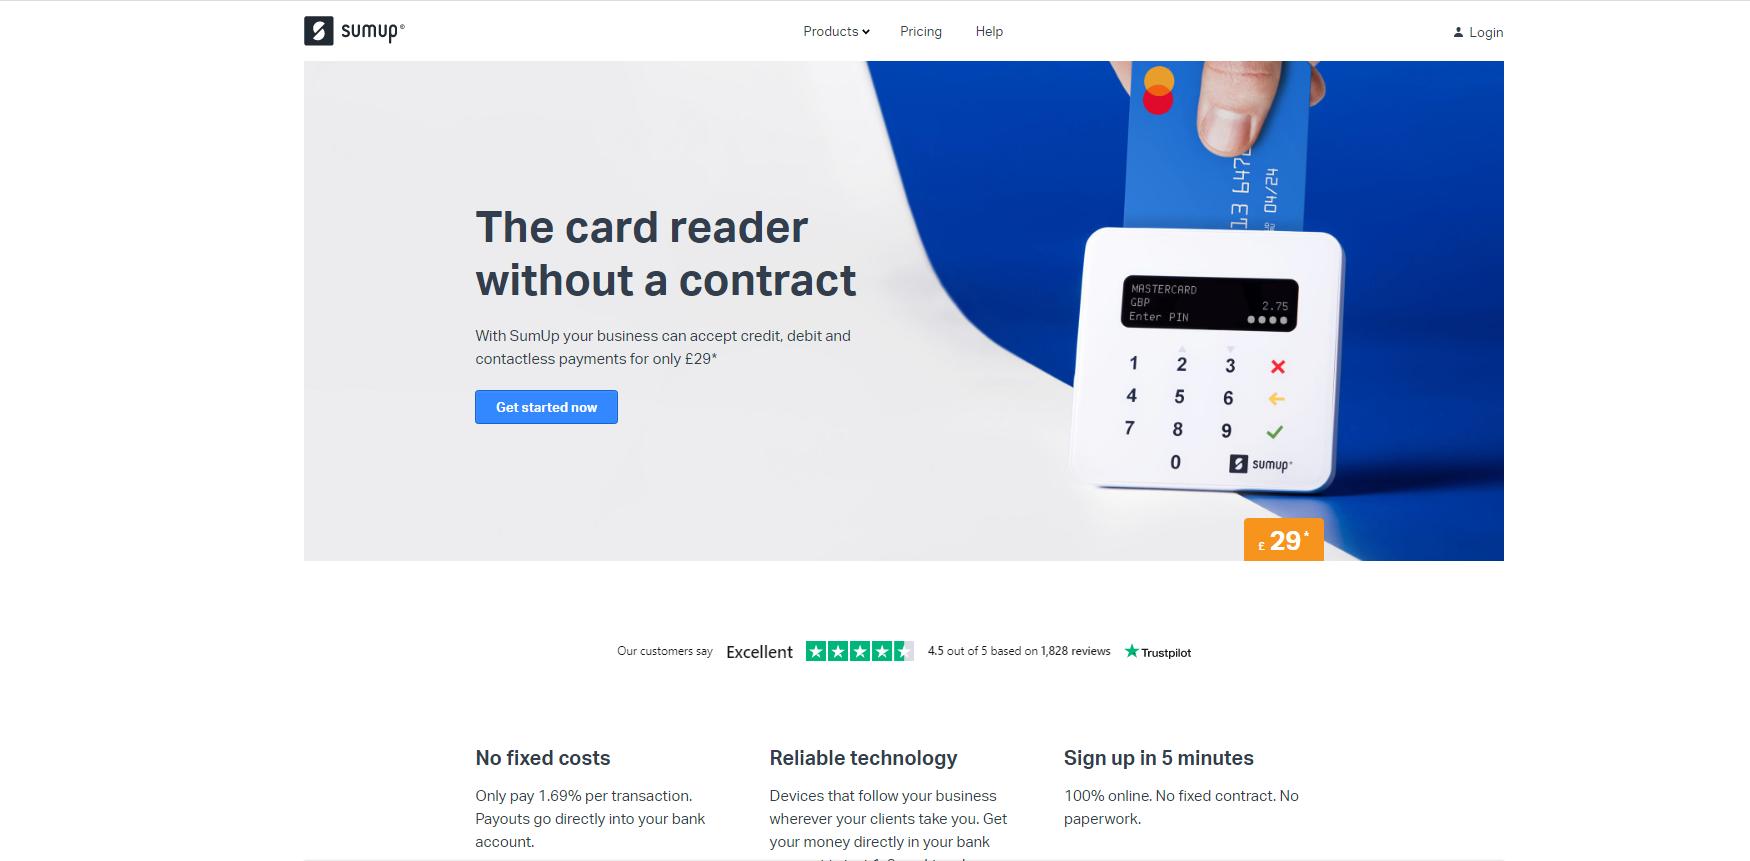 SumUp Card Reader Review 3